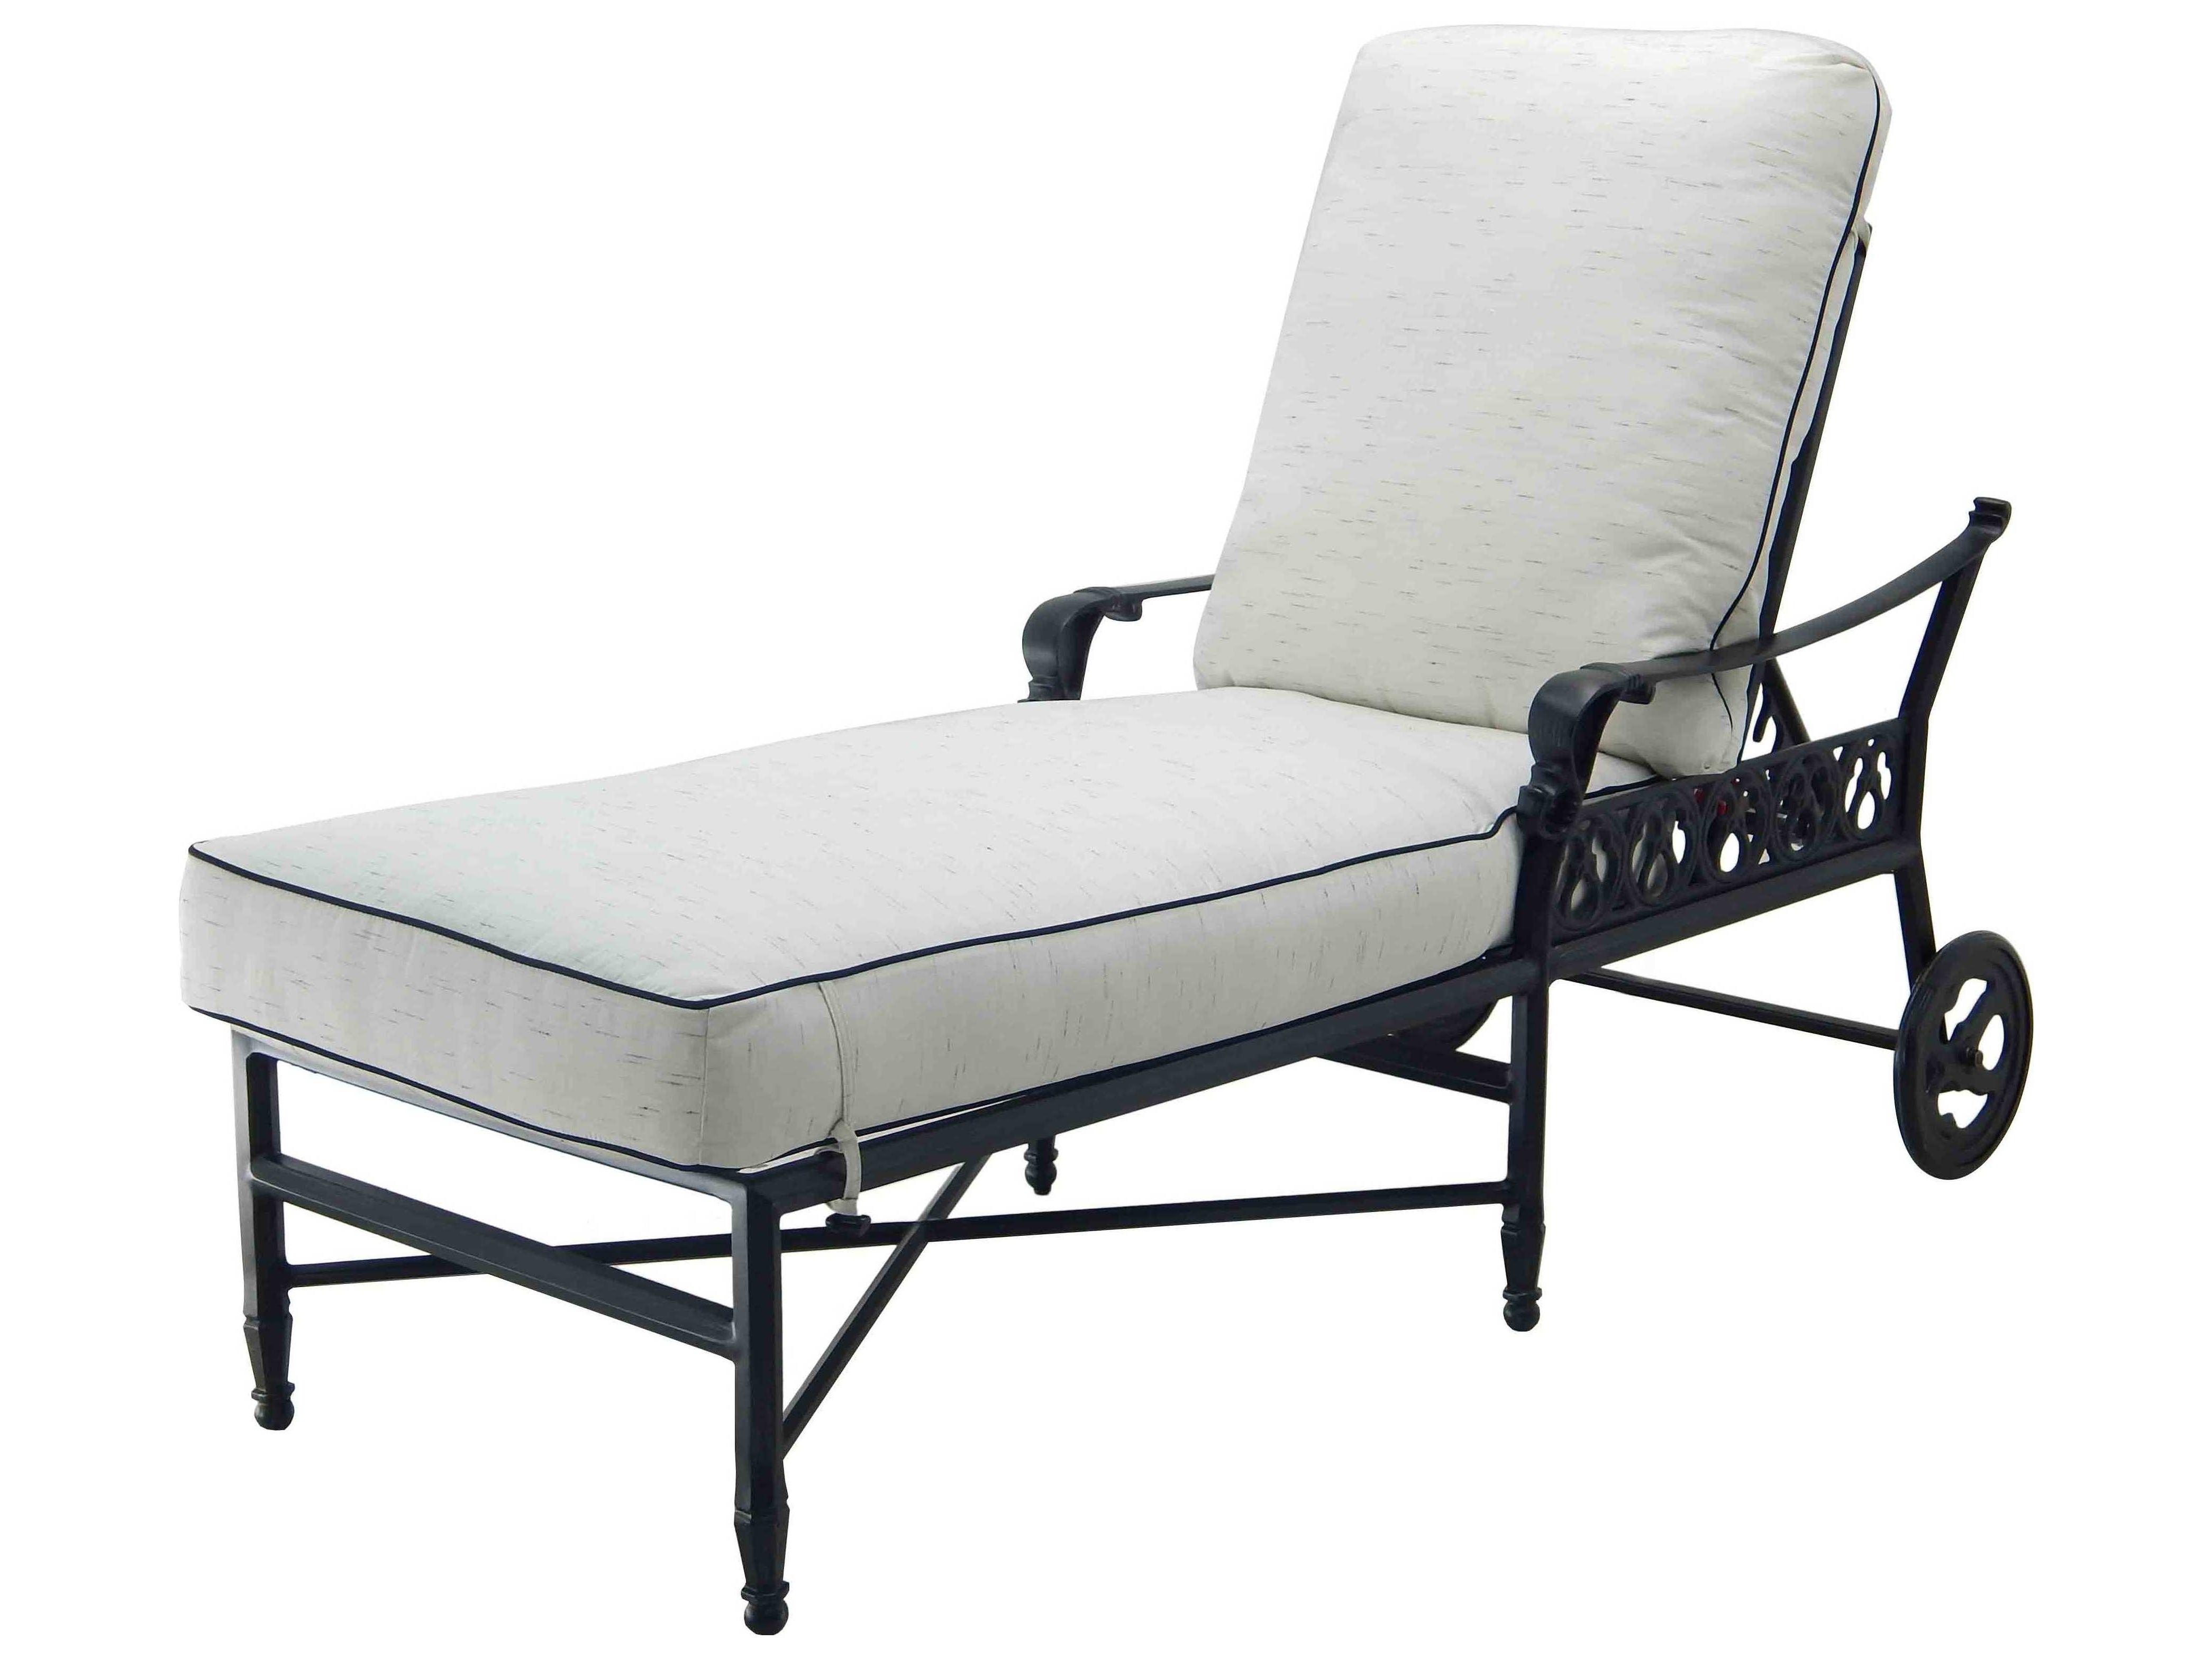 Outdoor Aluminum Adjustable Chaise Lounges Inside Most Current Castelle Biltmore Estate Cast Aluminum Adjustable Chaise Lounge With Wheels (View 11 of 25)